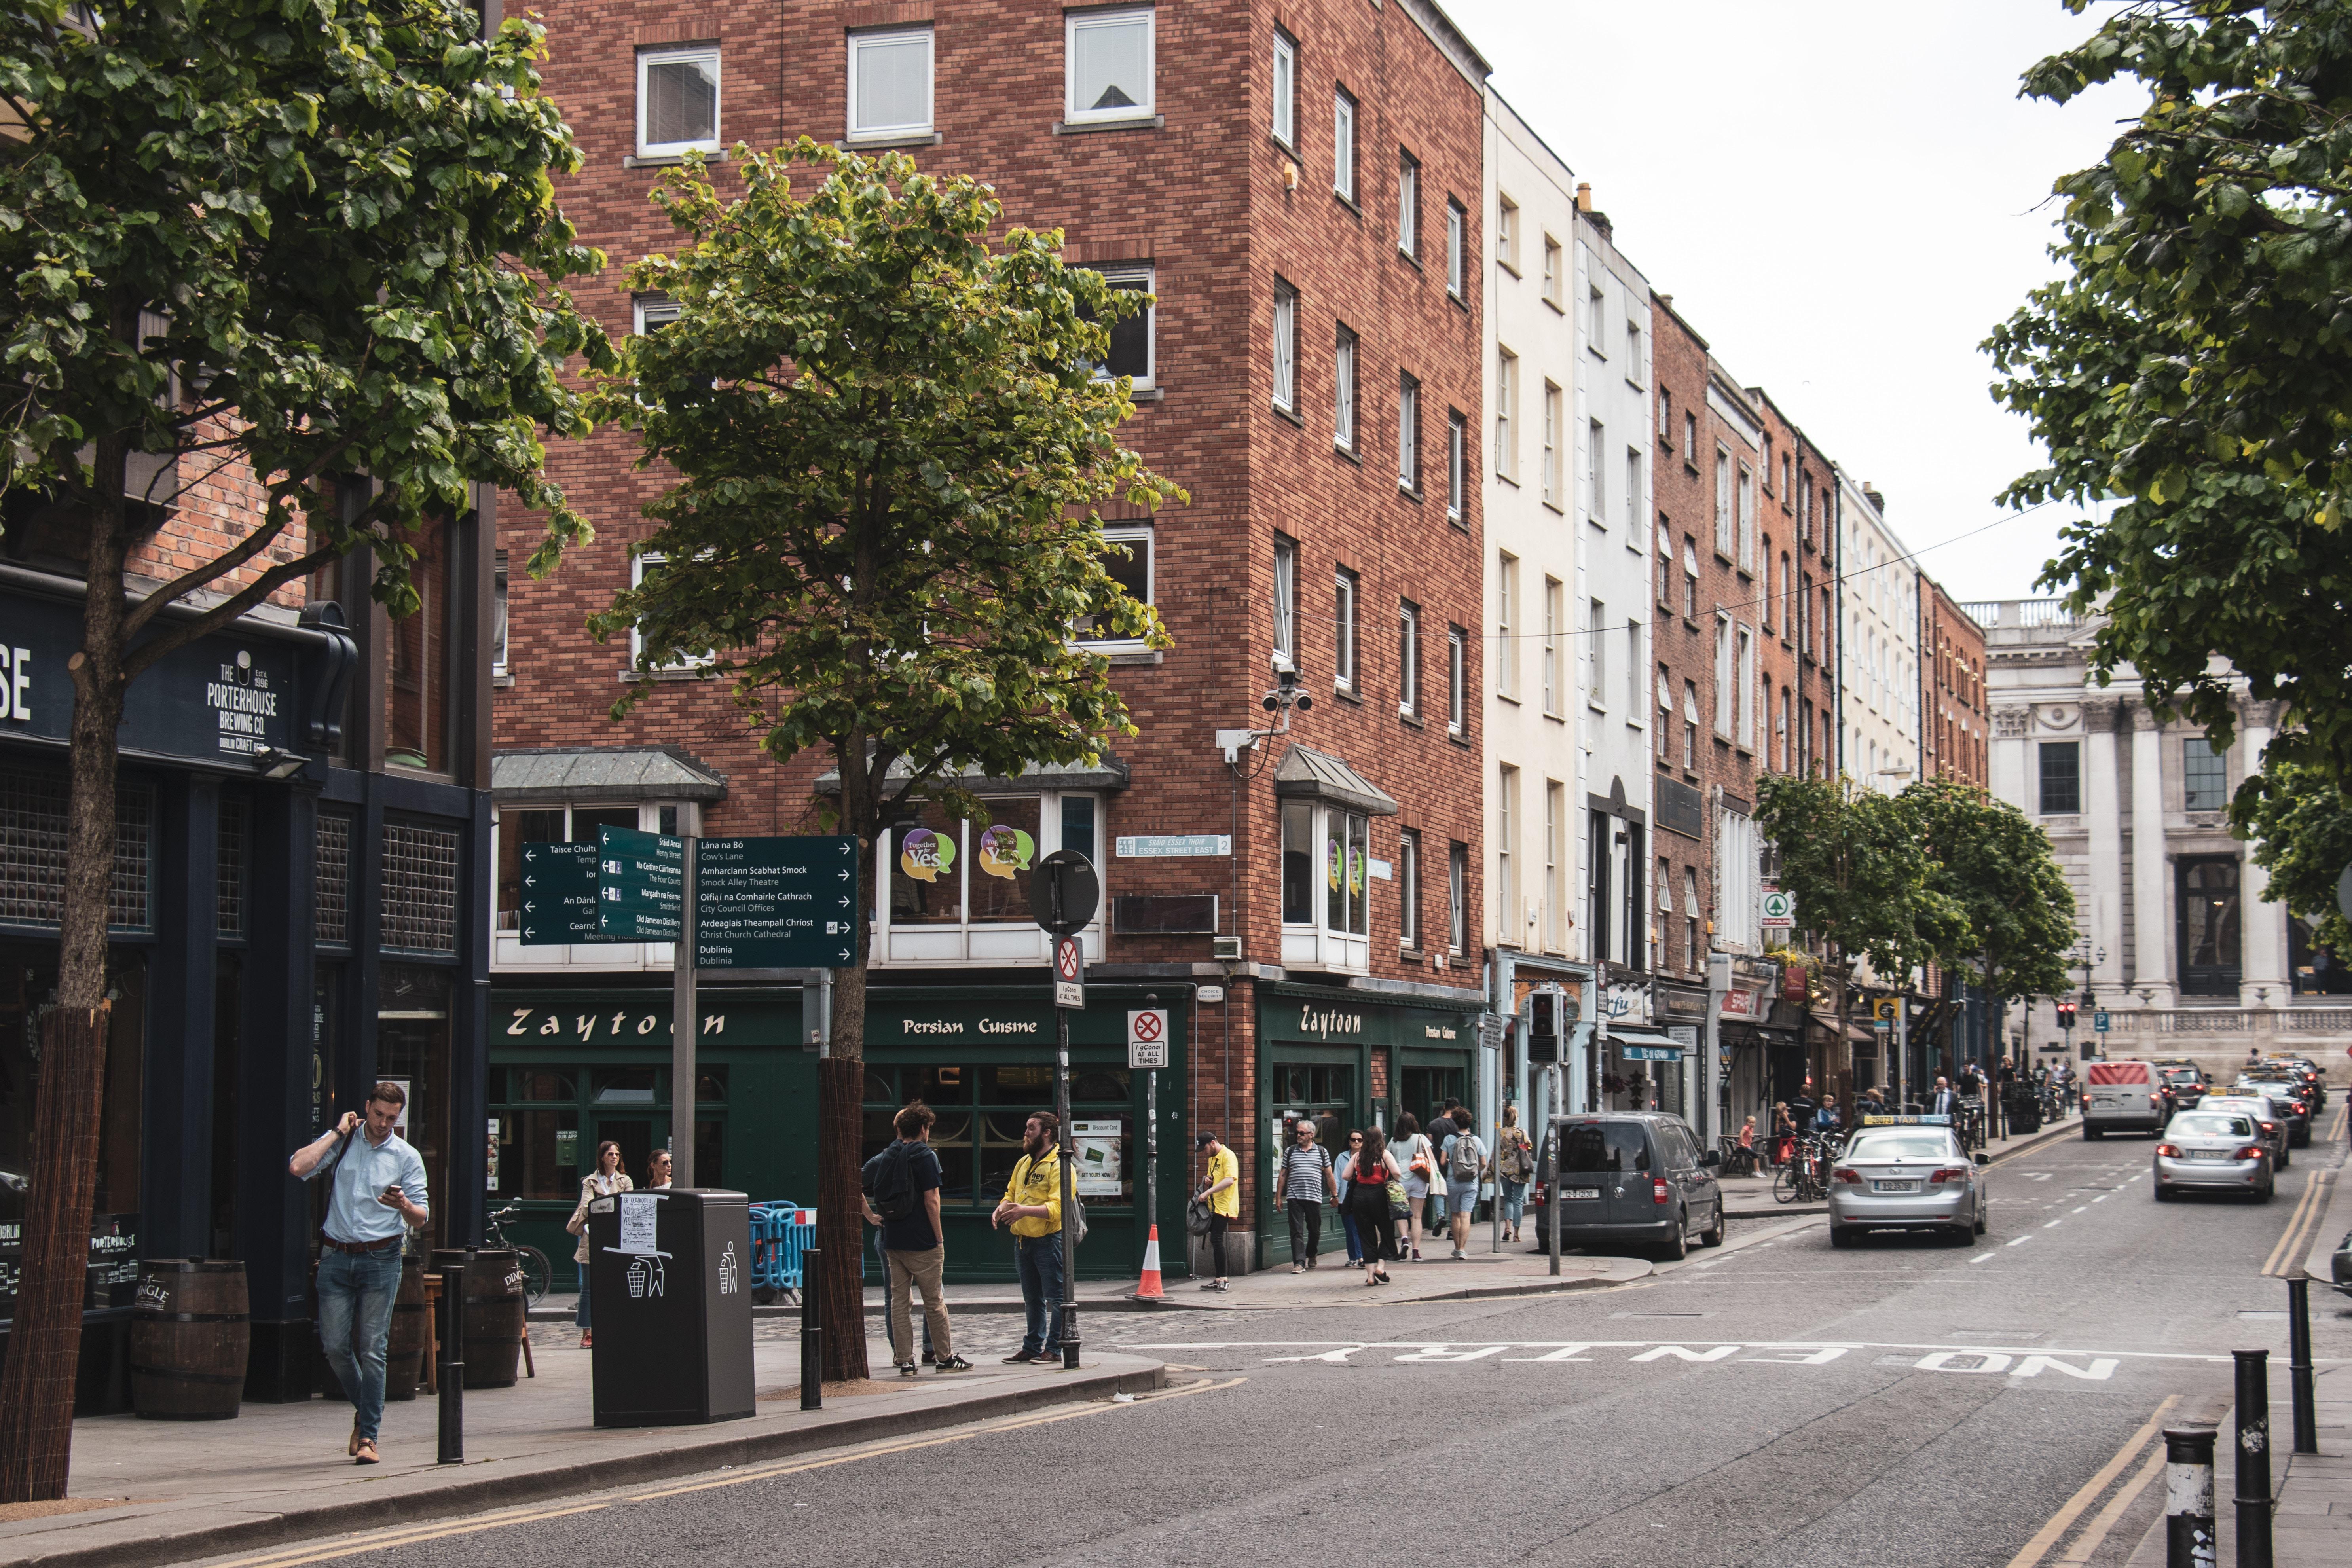 Image of expats walking around Dublin